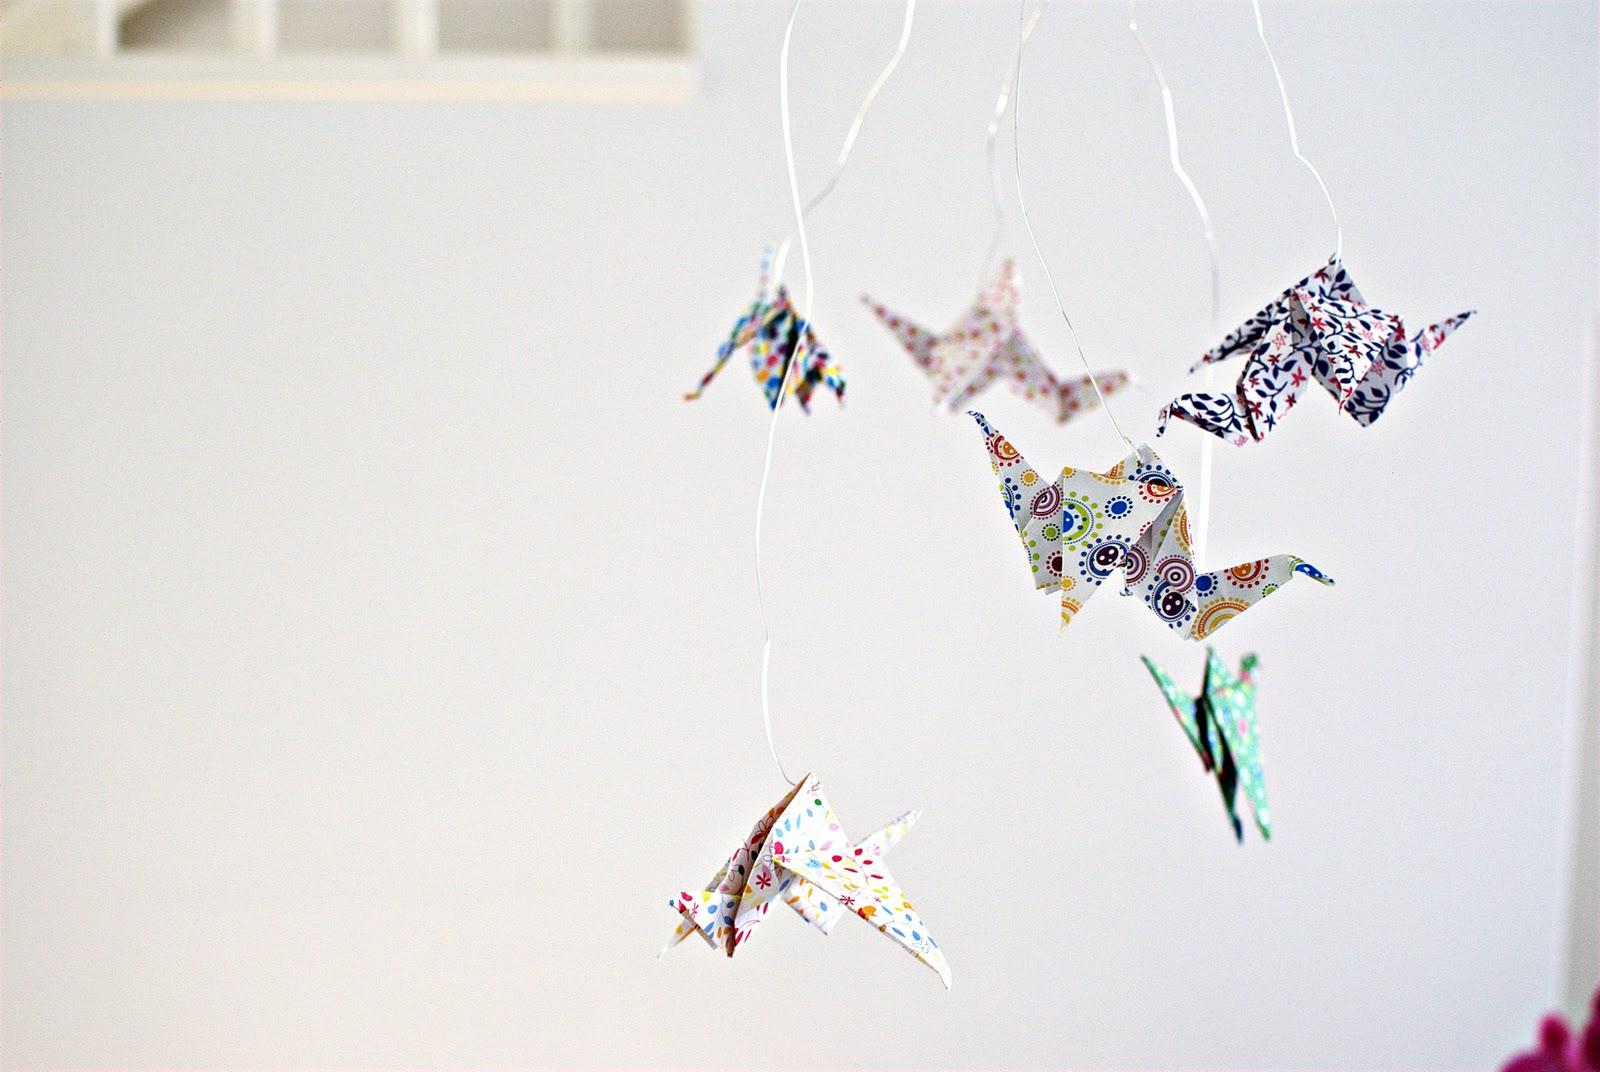 Poser du papier peint (Castorama) YouTube - Installer Du Papier Peint